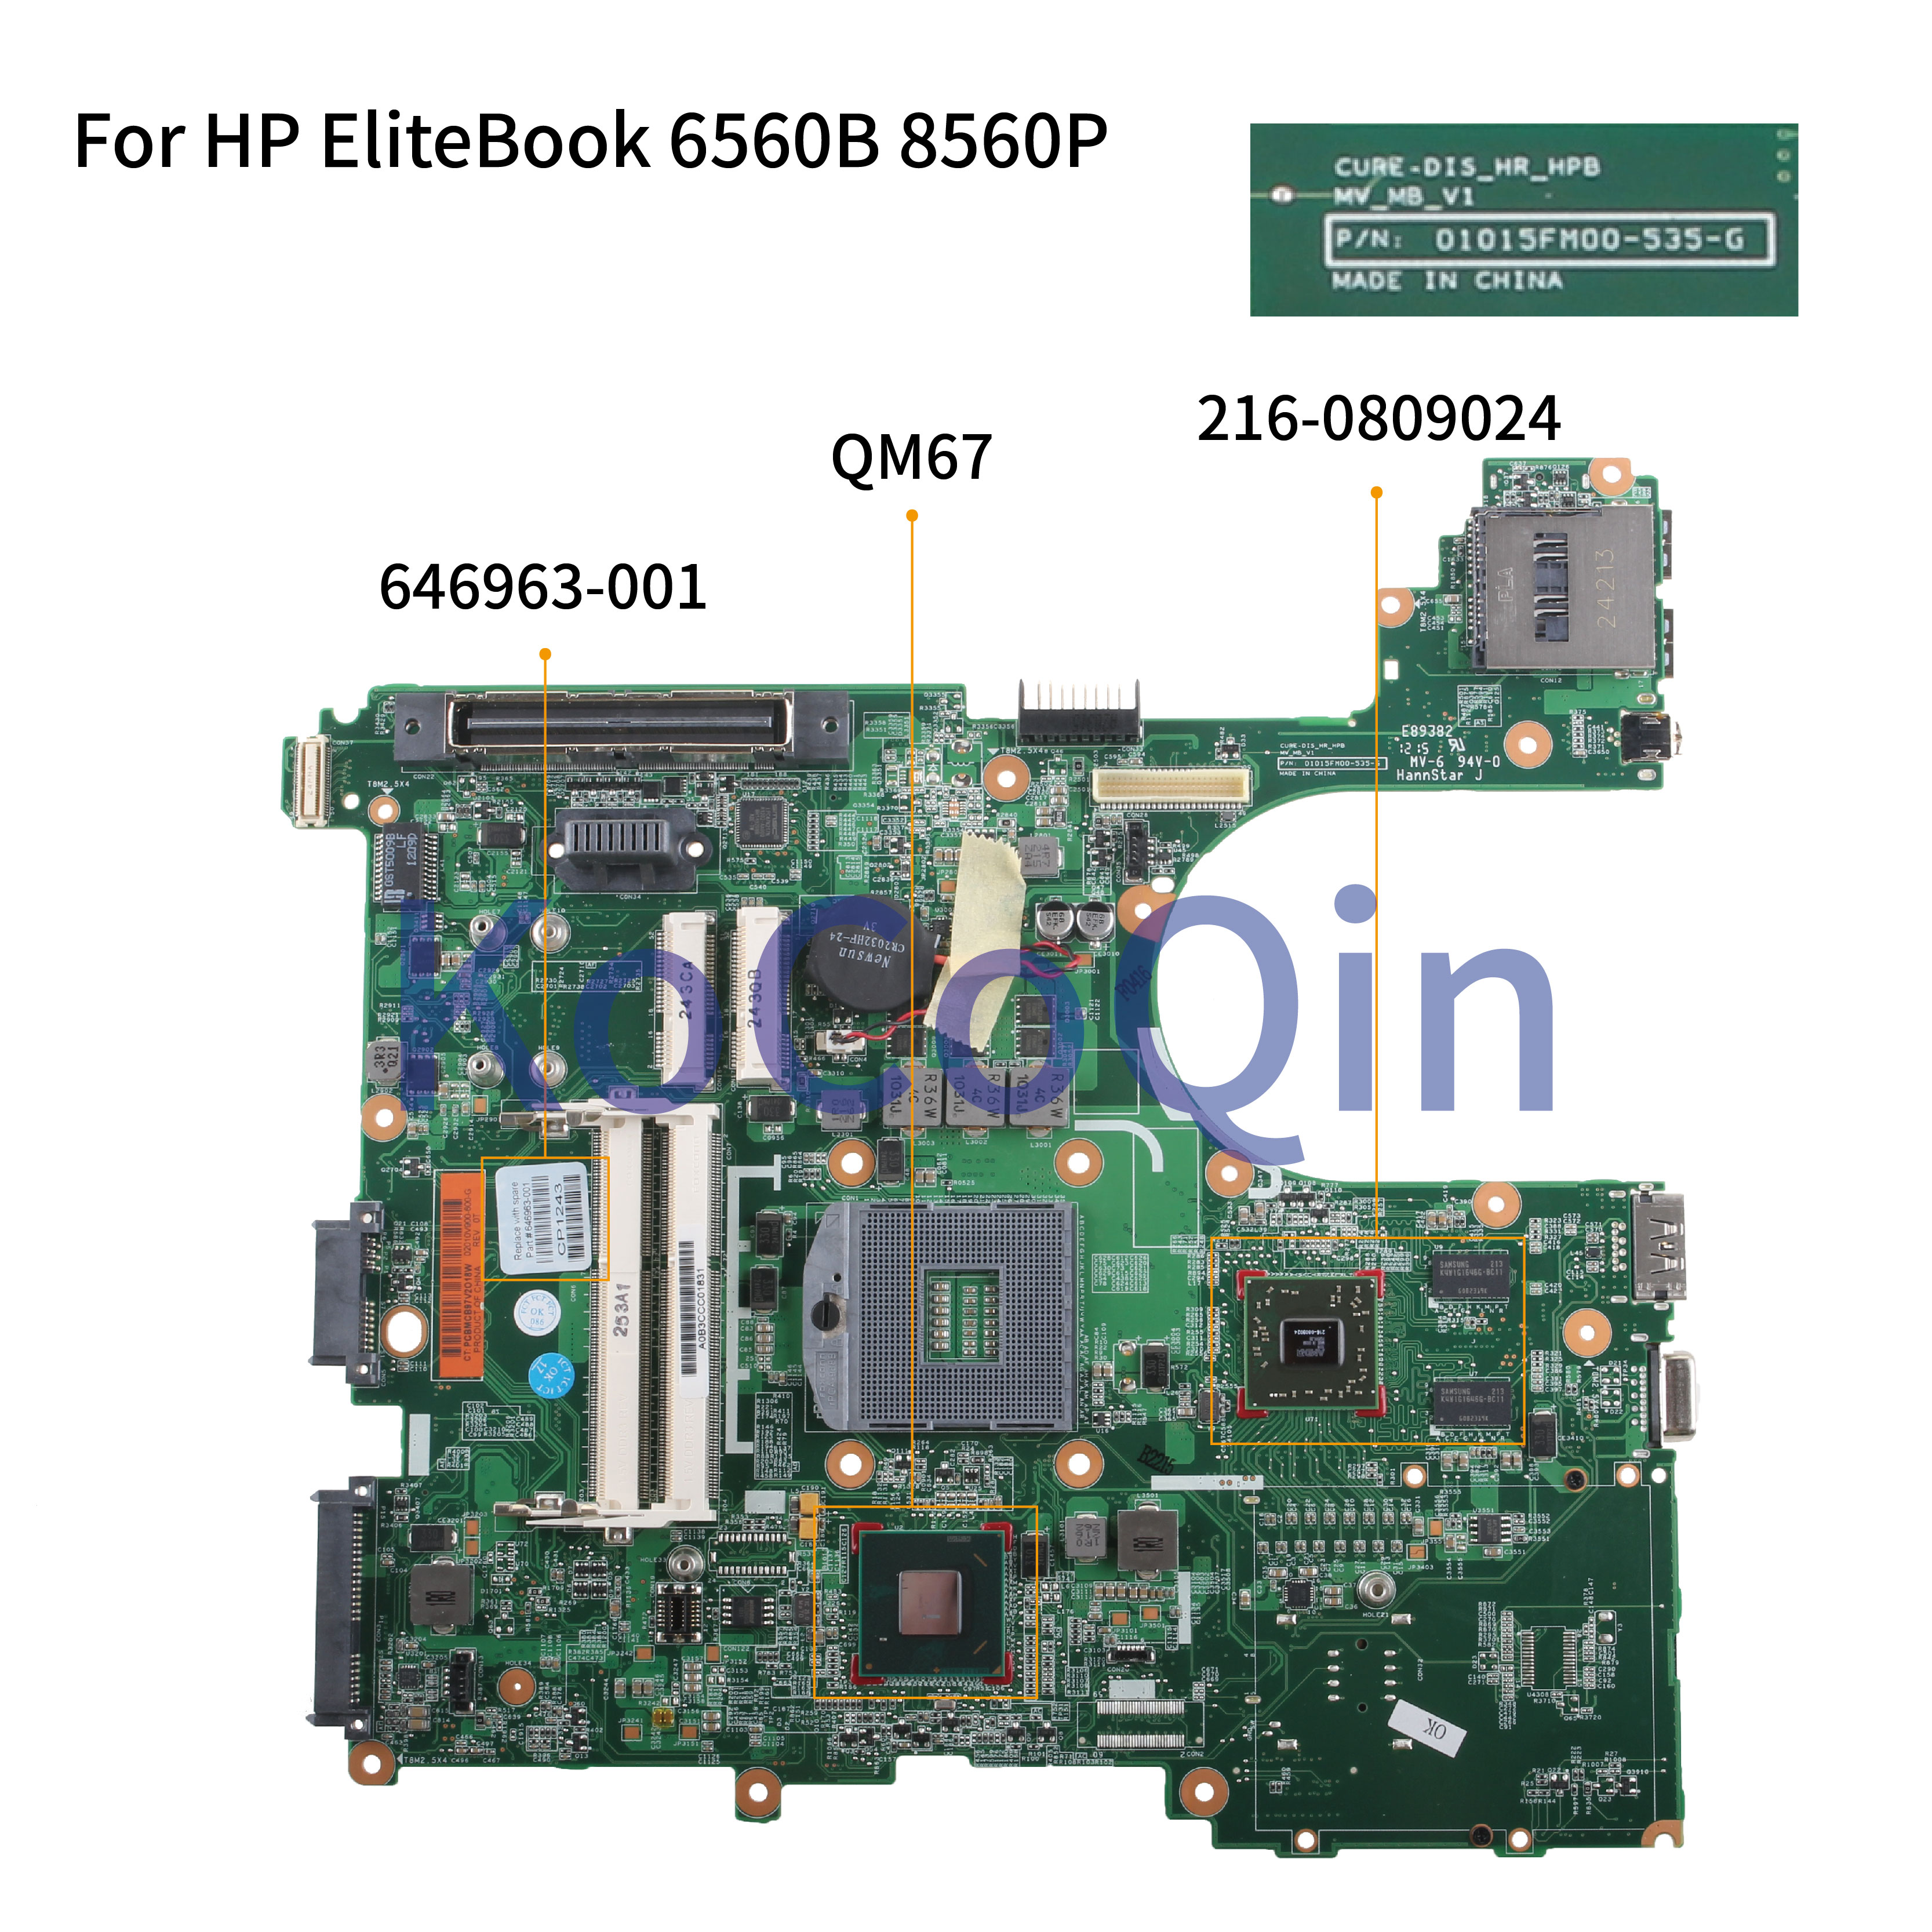 6560B KoCoQin Laptop motherboard Para HP EliteBook 8560P Mainboard 646963 646963 501 0105FM00 001 QM67 1G 216 0809024|Placa-mãe para notebook| |  -